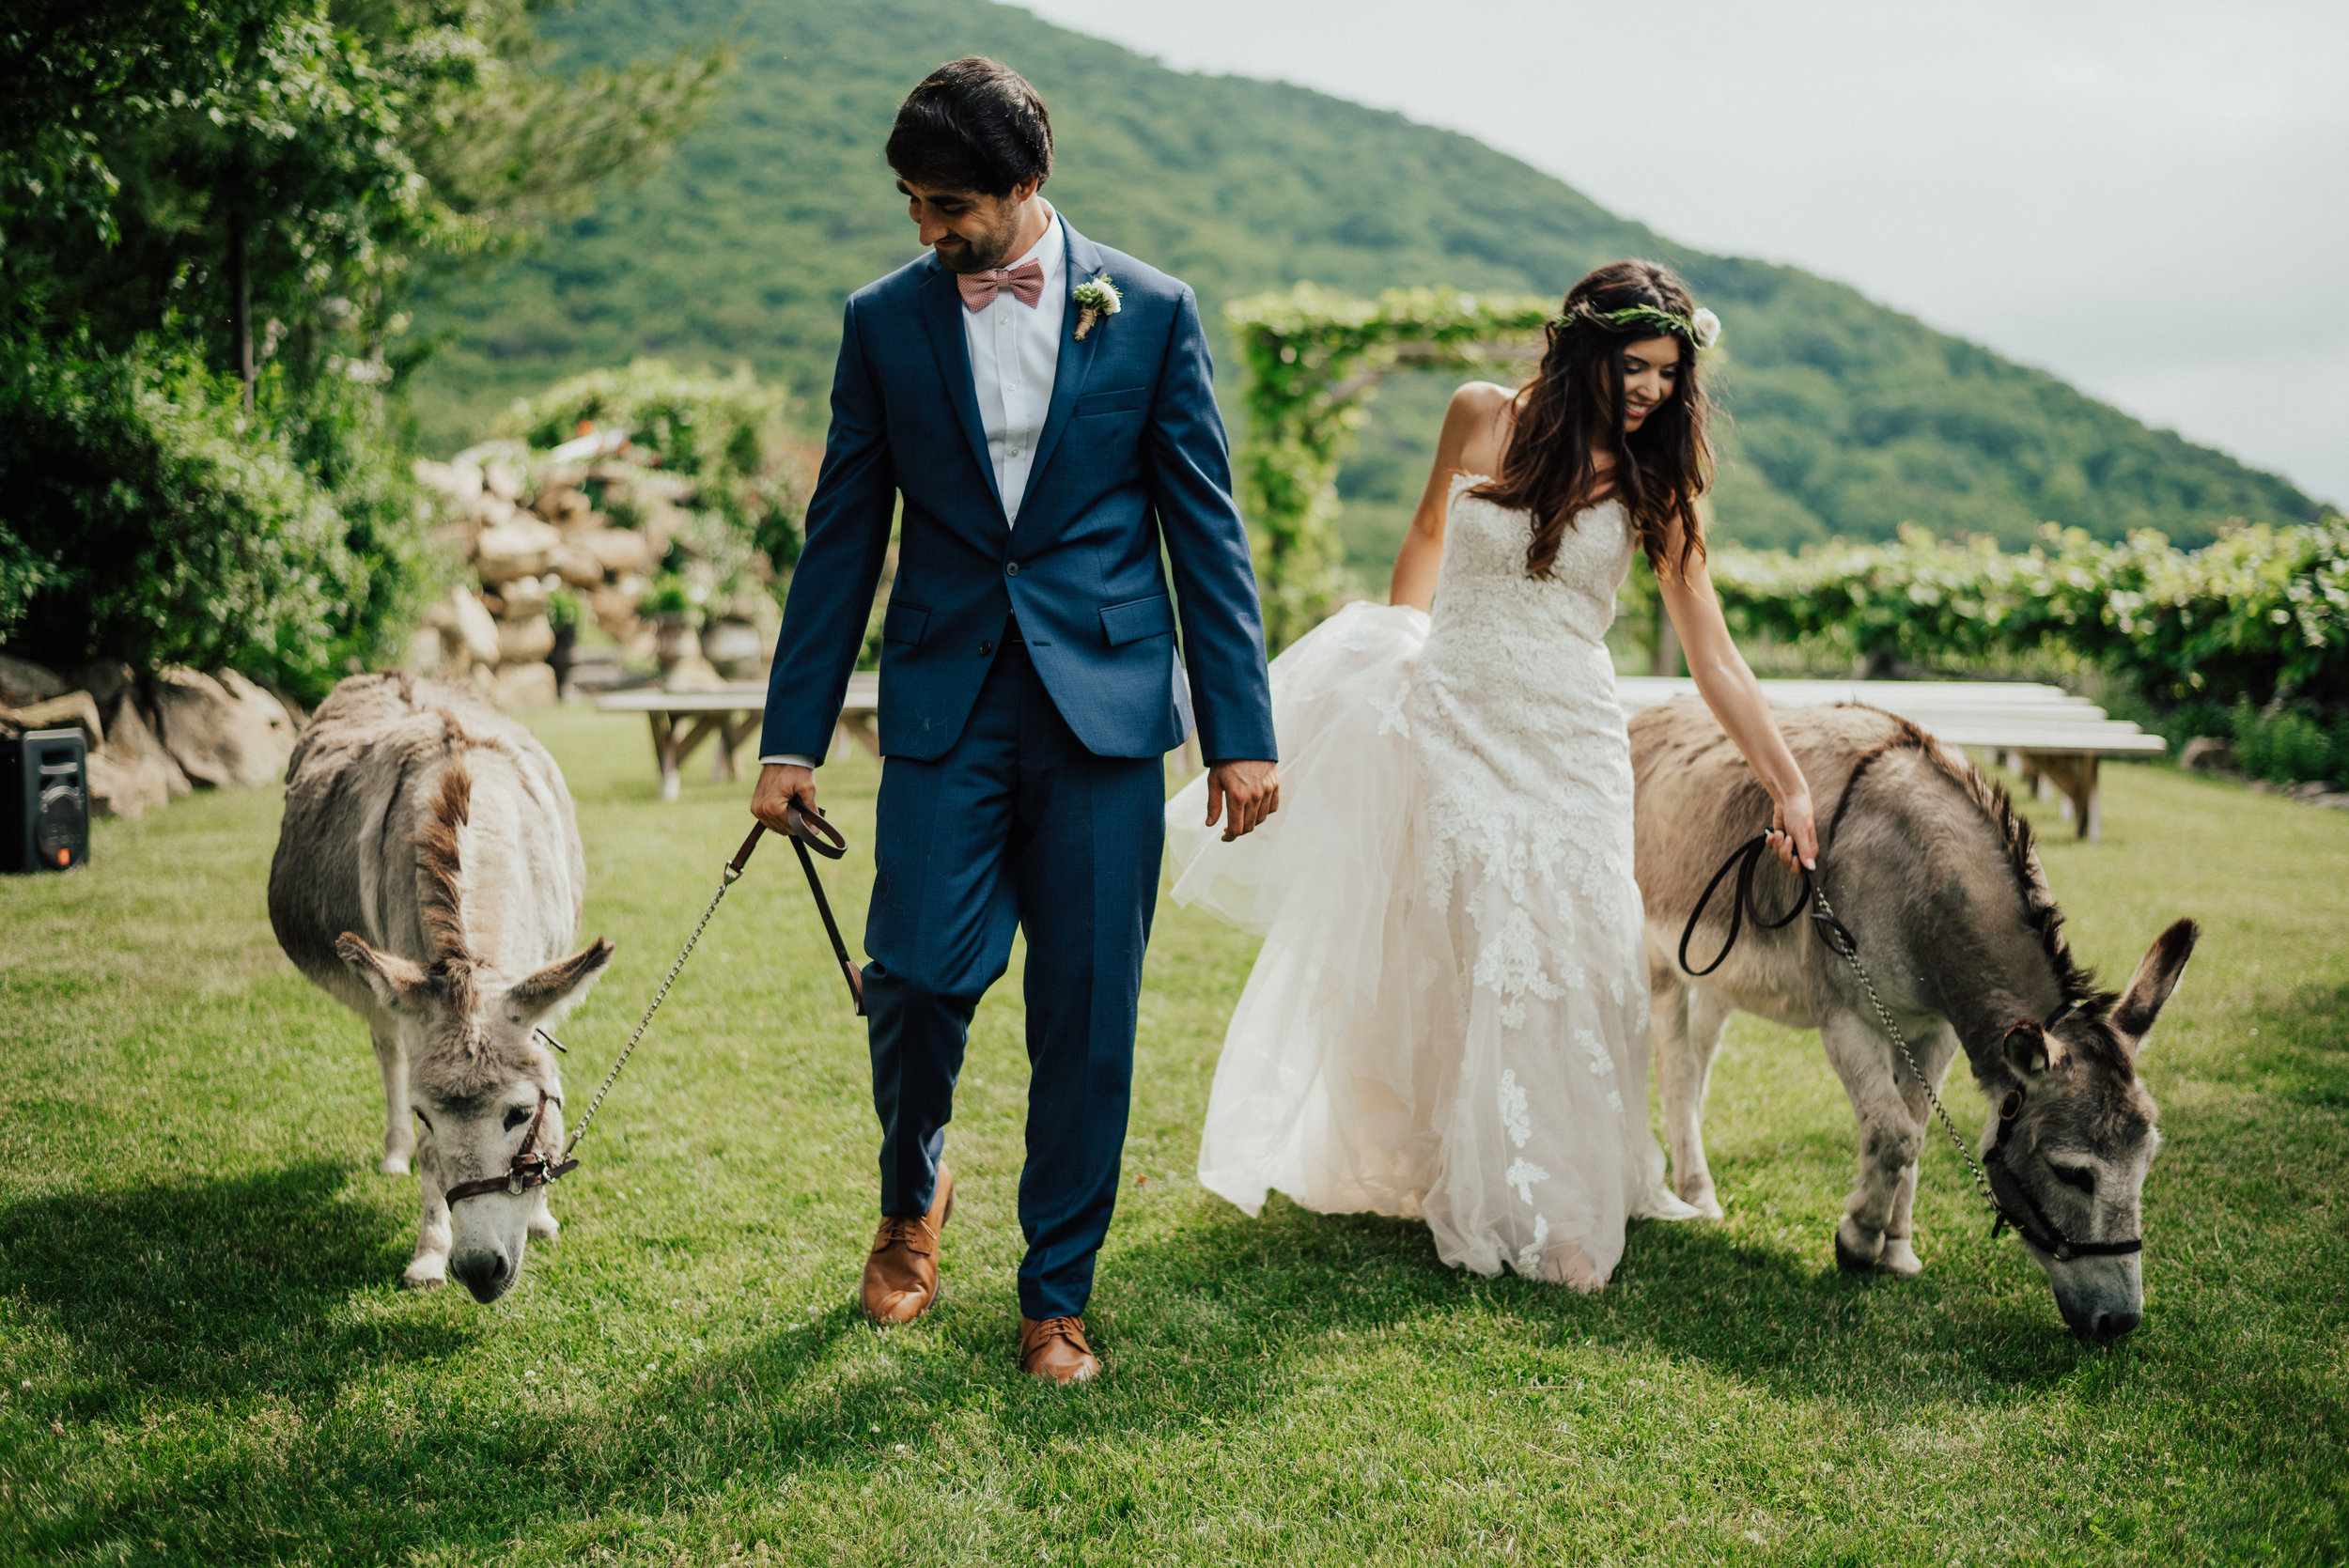 myriah-byron-wedding_pre-ceremony236.jpg